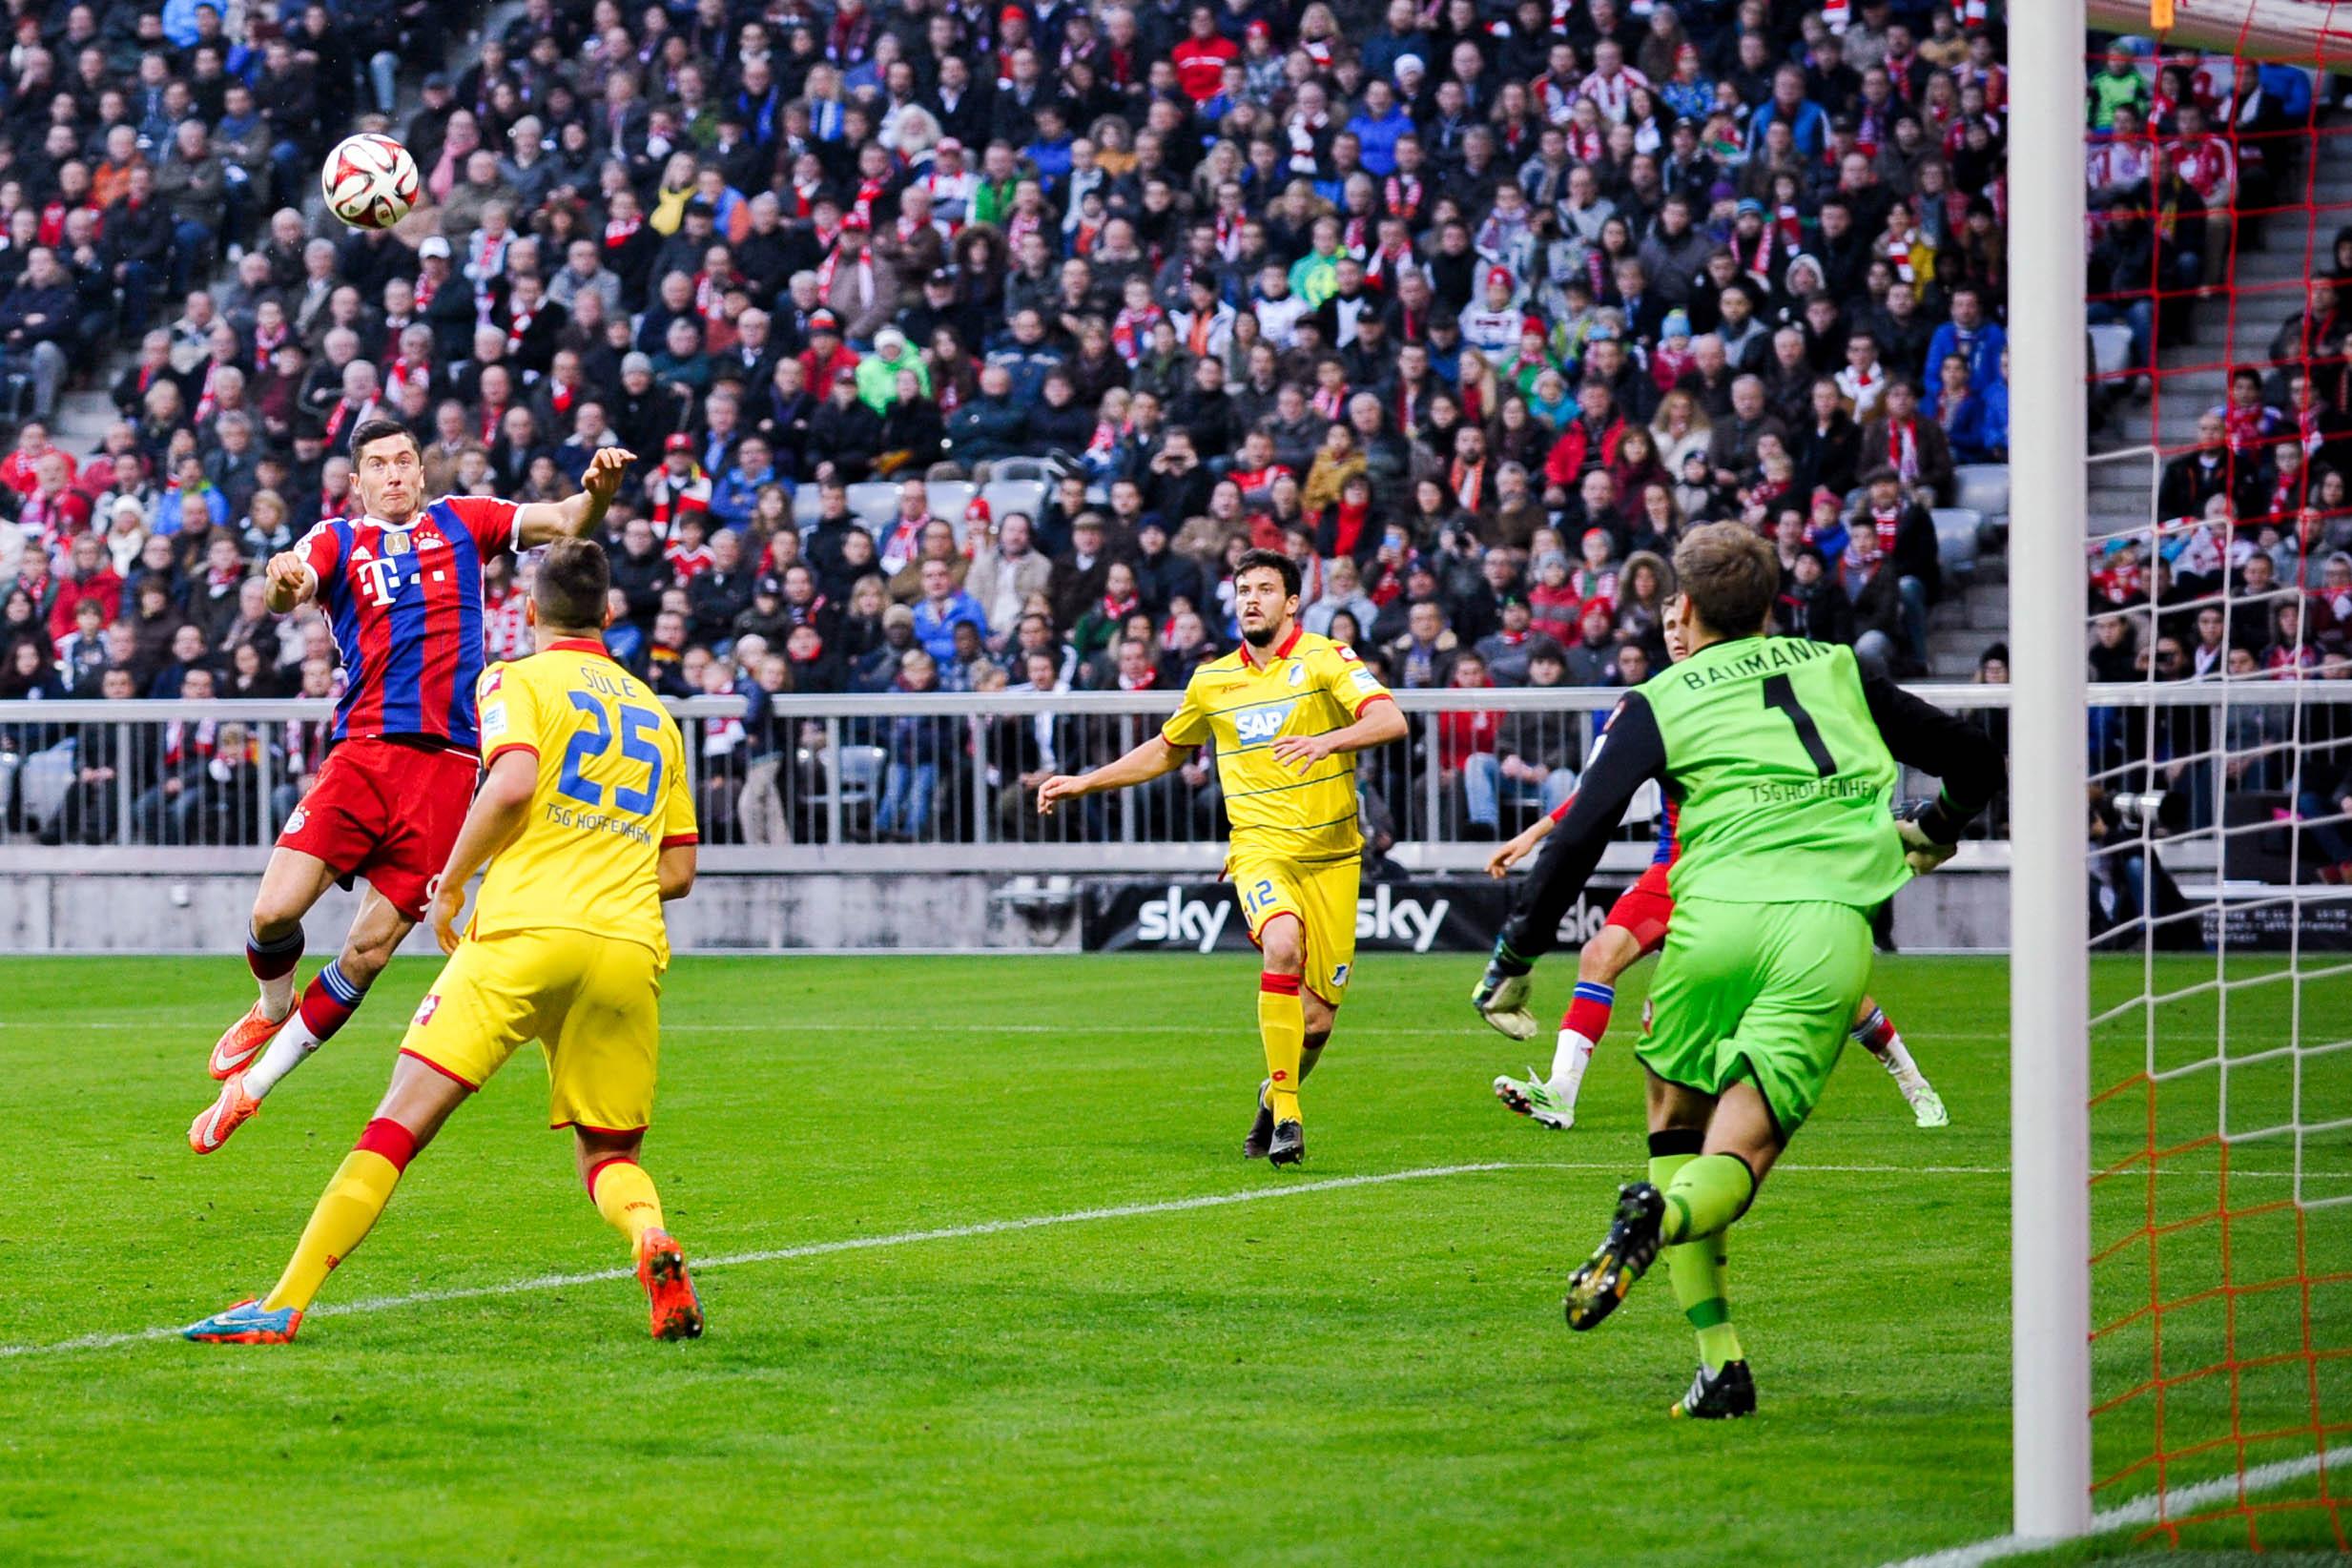 Stadion_FCB_vs_TSGH_22.11.2014_web-28.jpg